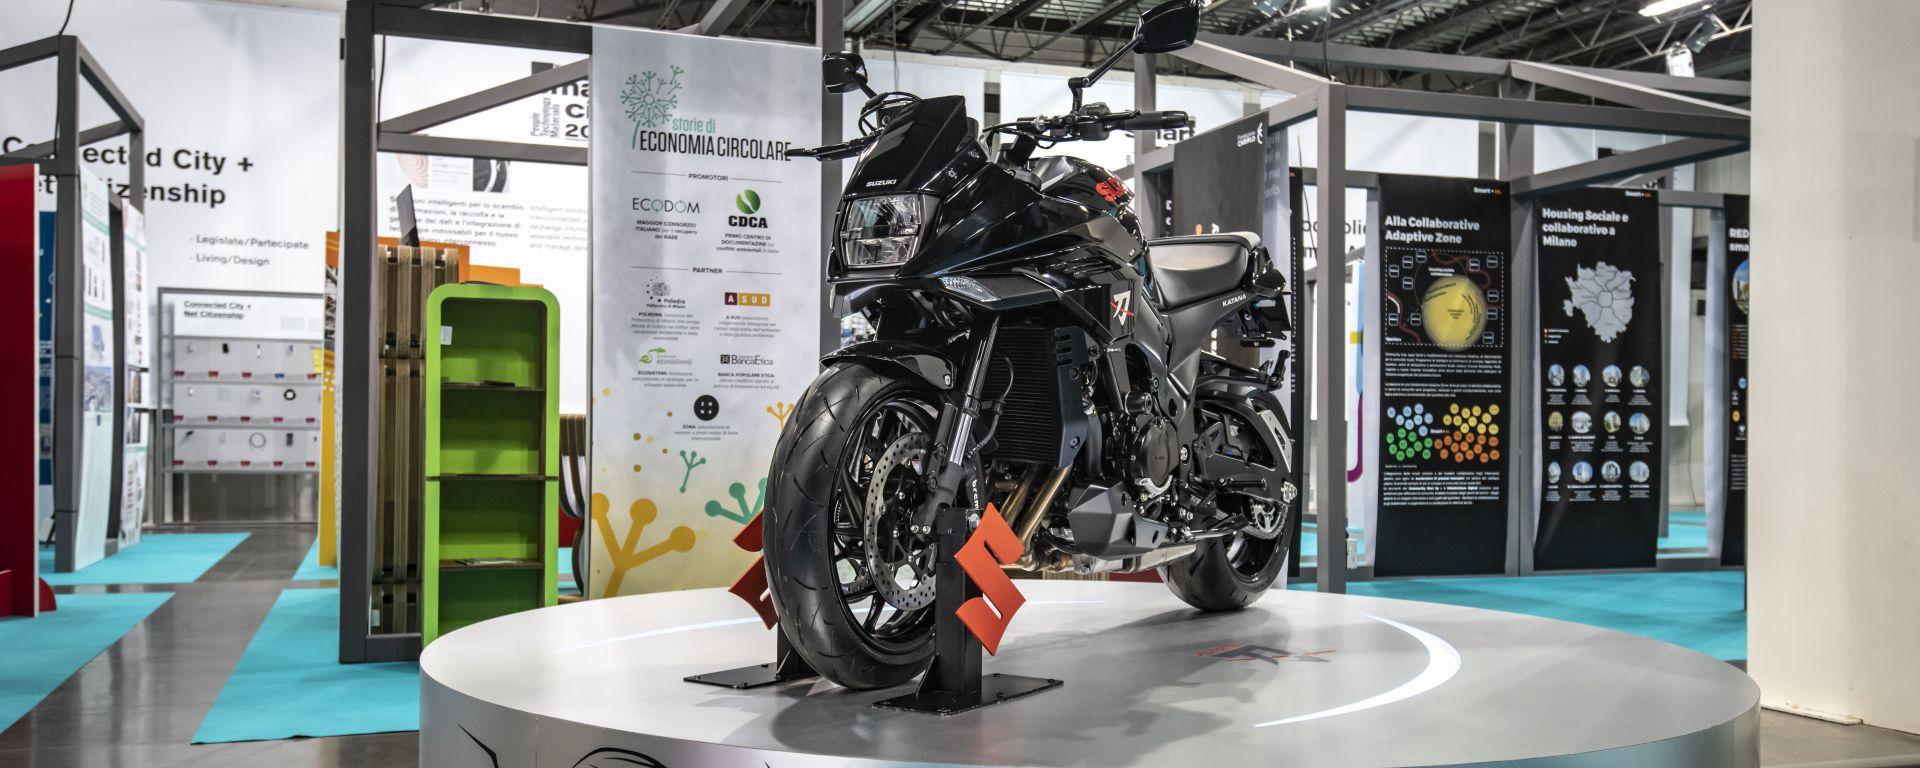 Suzuki Katana: ponte tra Digital e Design week a Milano